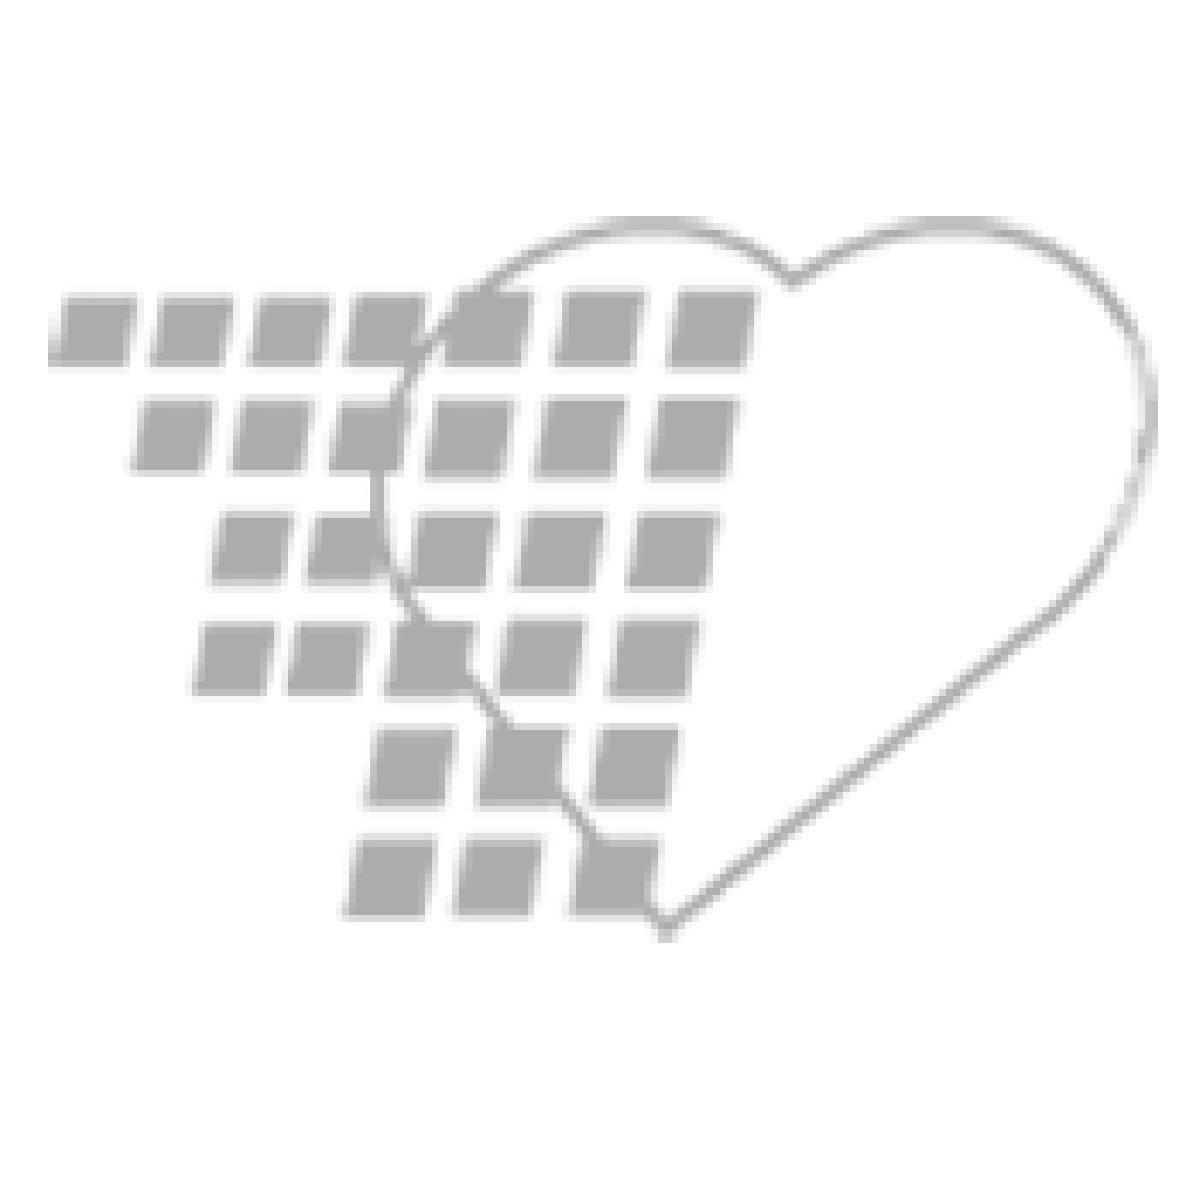 05-68-0210 - ErgoBelt® 3100  ErgoSafe's® Soft Transfer Gait Belt